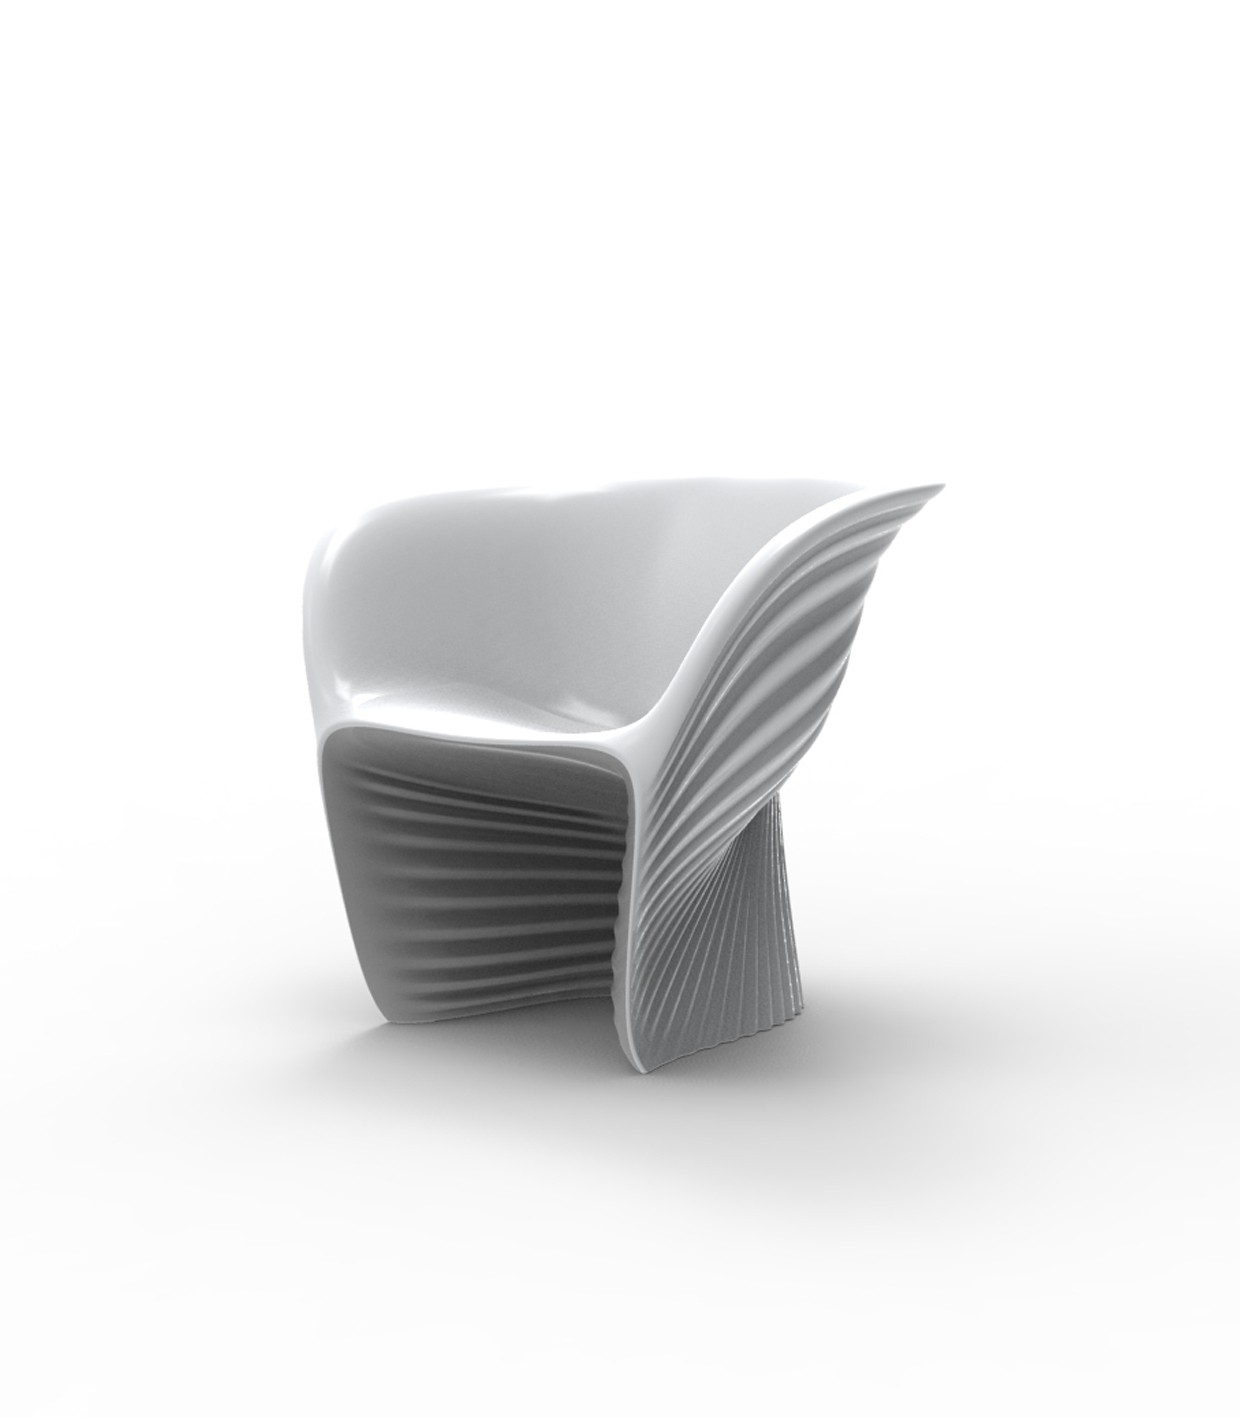 fauteuil bicolore biophilia de vondom acier. Black Bedroom Furniture Sets. Home Design Ideas